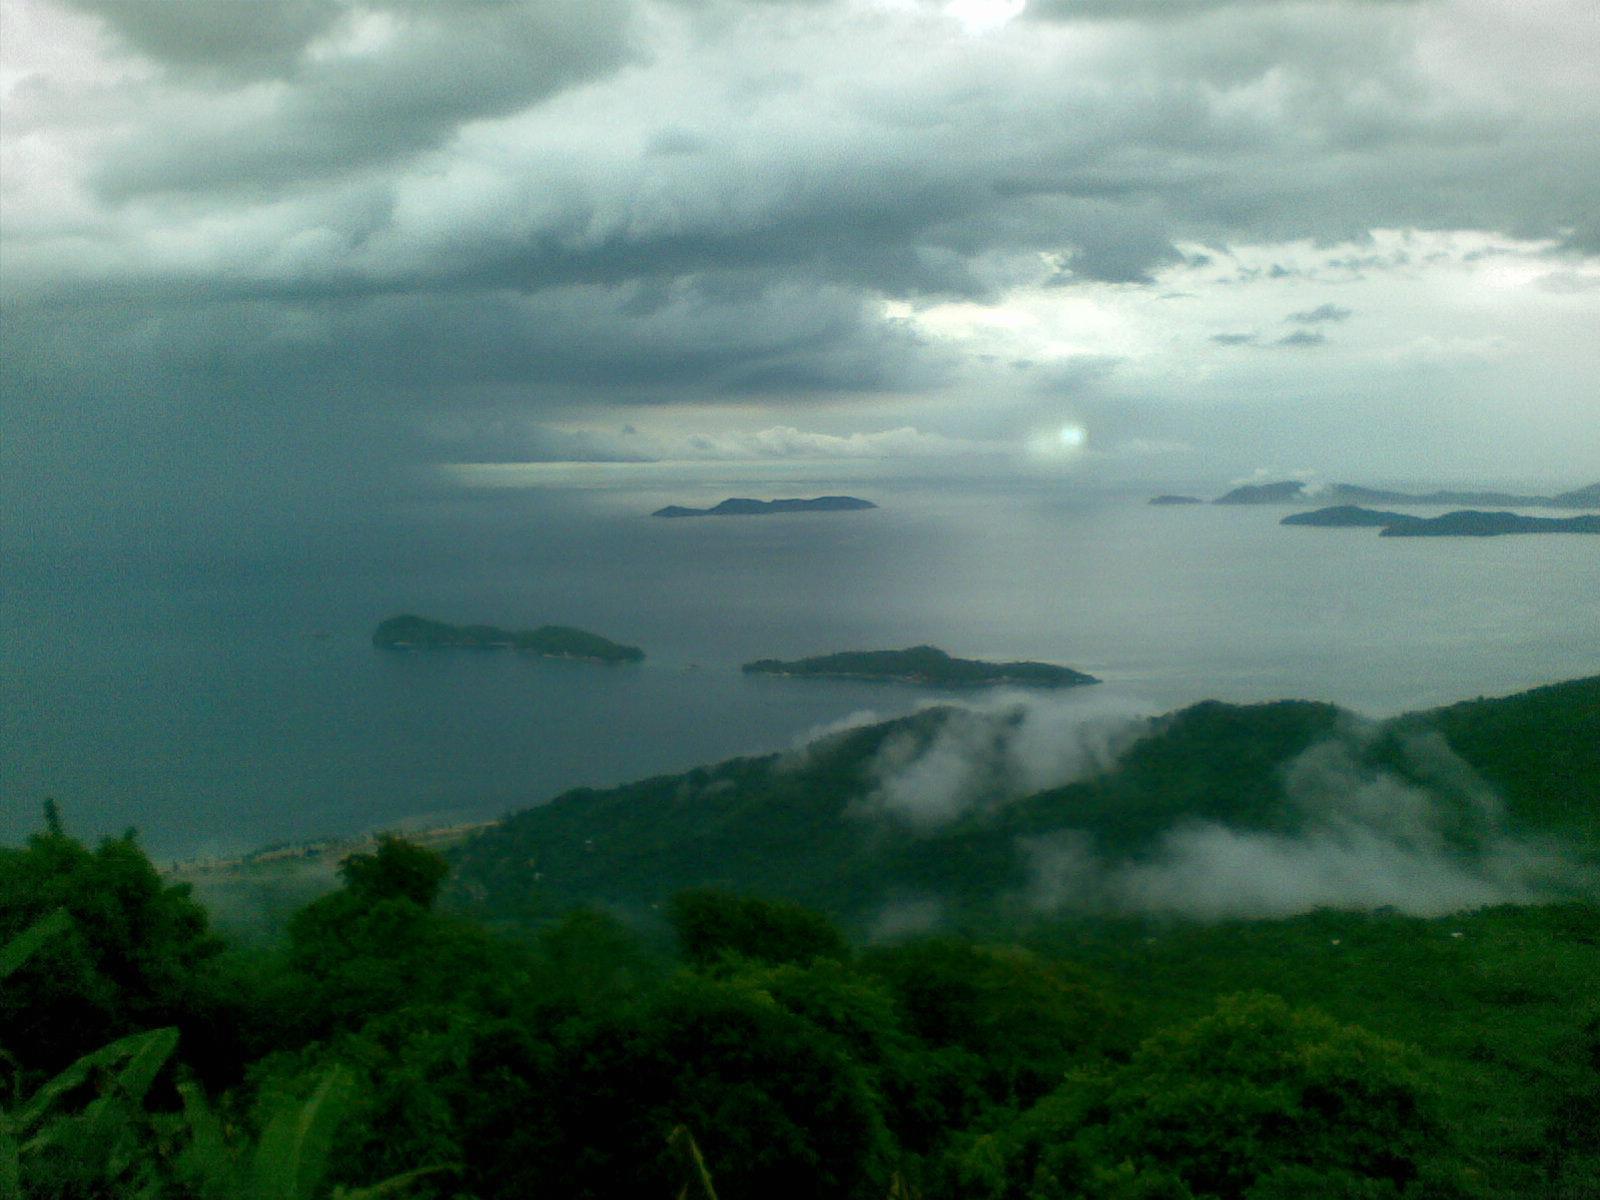 10. Se acerca un huracán. Parque Nacional Mochima. Autor, Worlds9thwonder